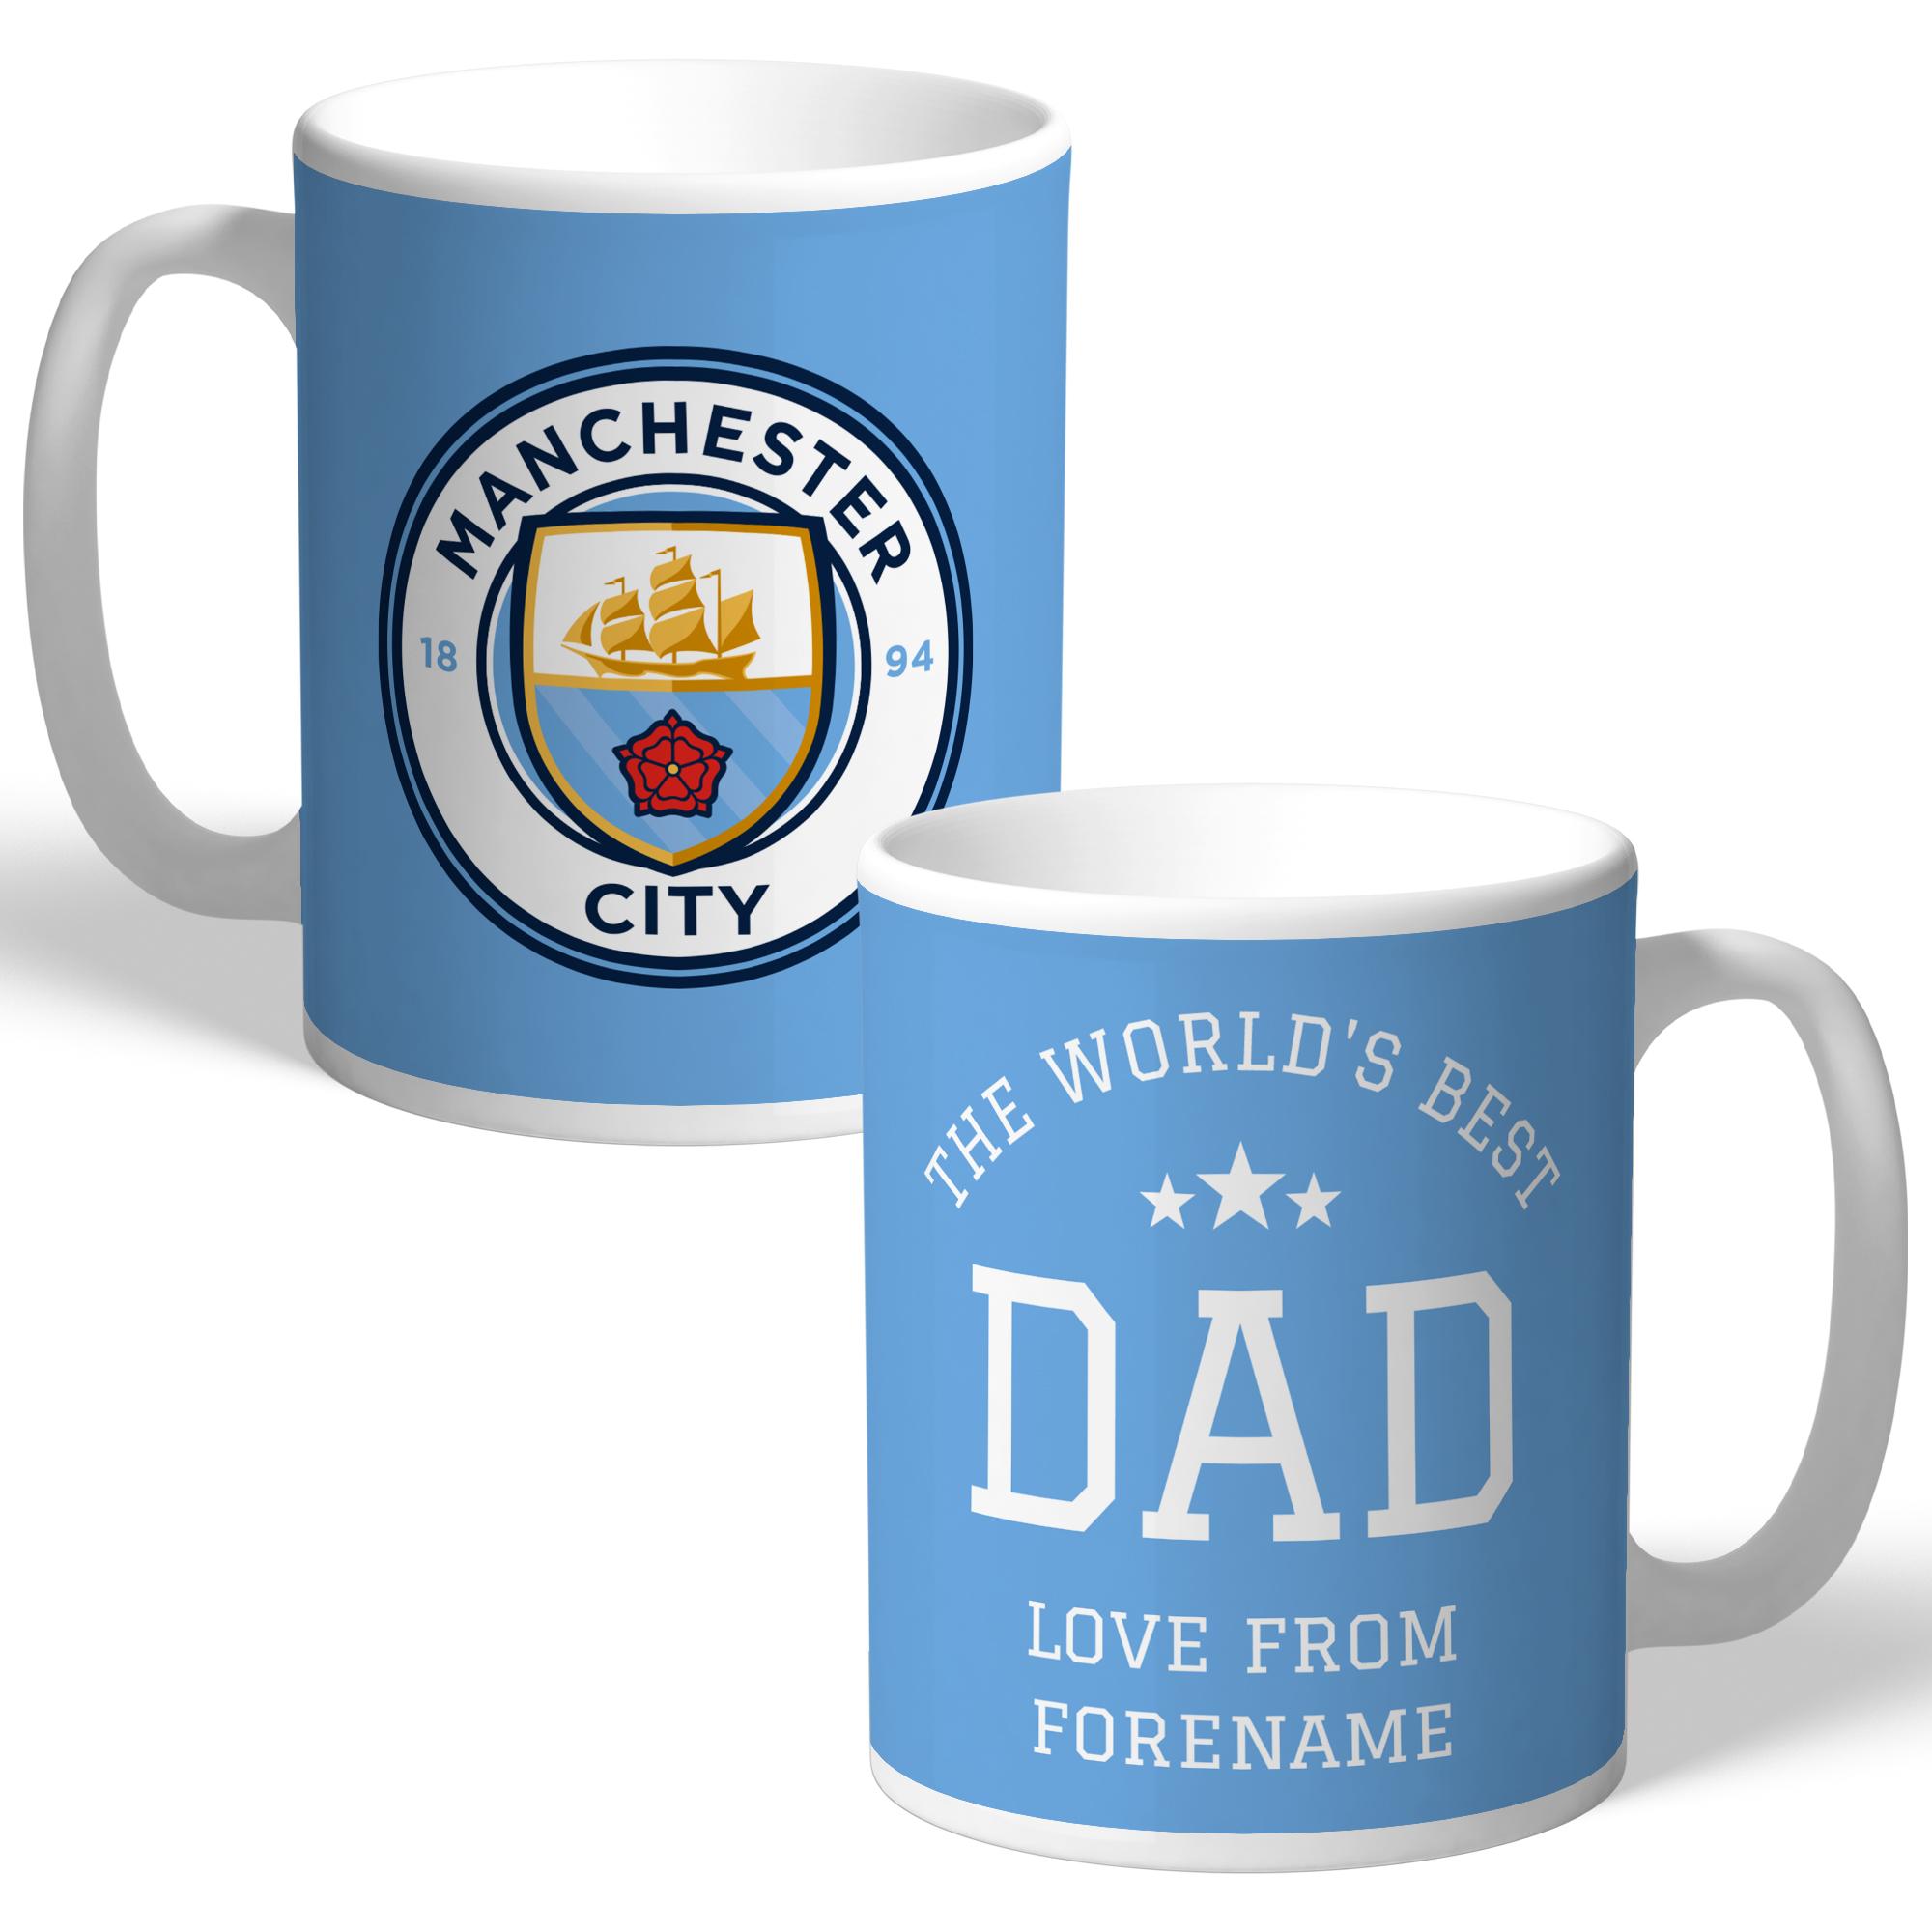 Manchester City FC World's Best Dad Mug